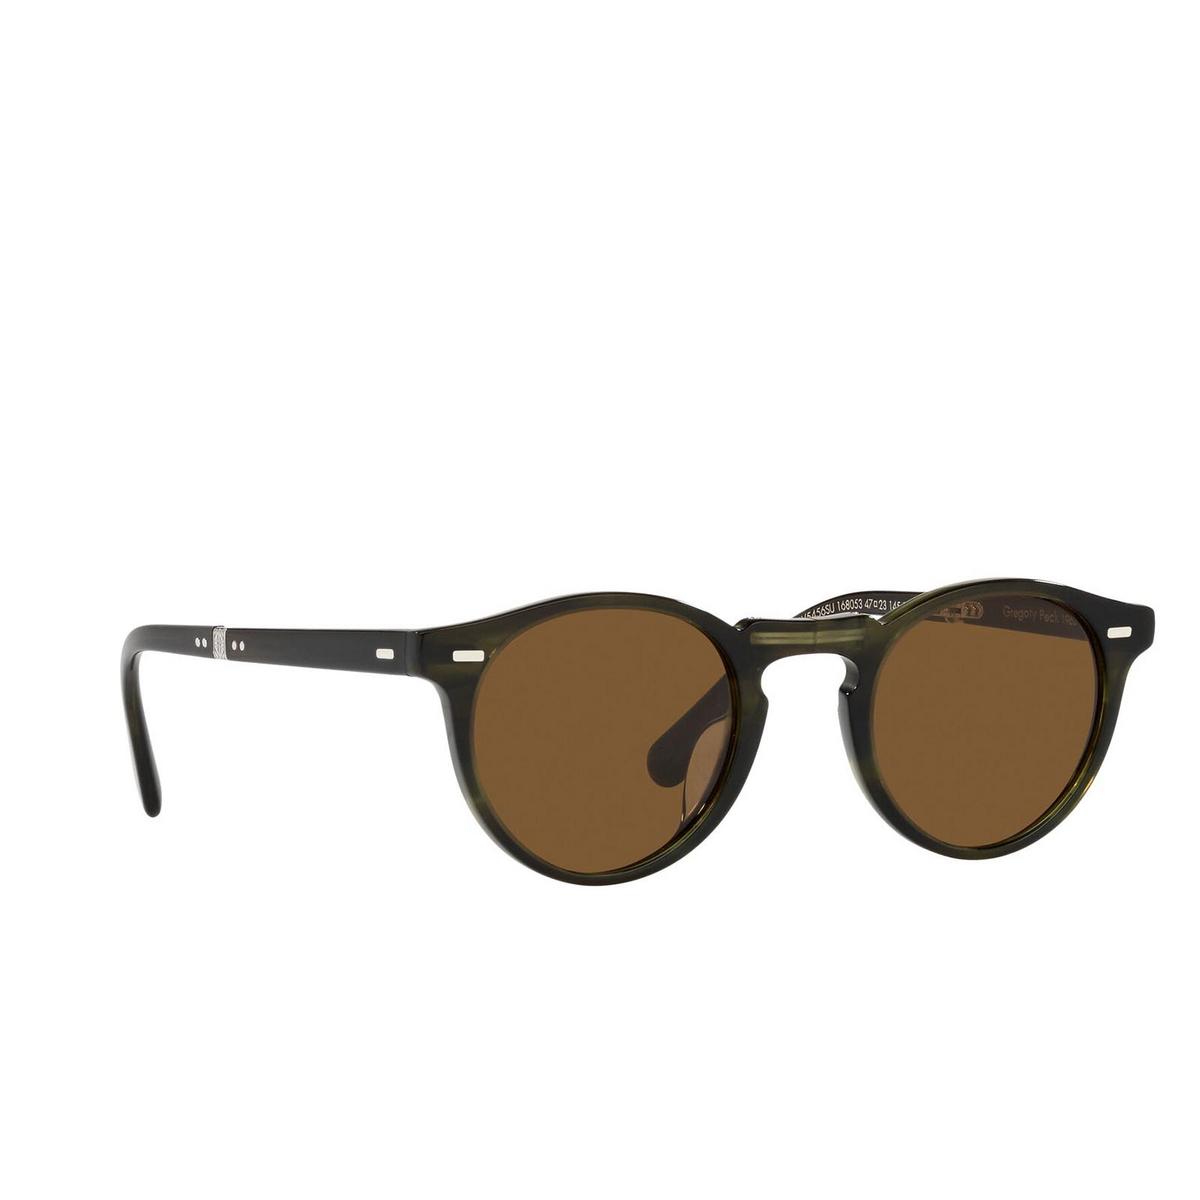 Oliver Peoples® Round Sunglasses: Gregory Peck 1962 OV5456SU color Emerald Bark 168053 - three-quarters view.